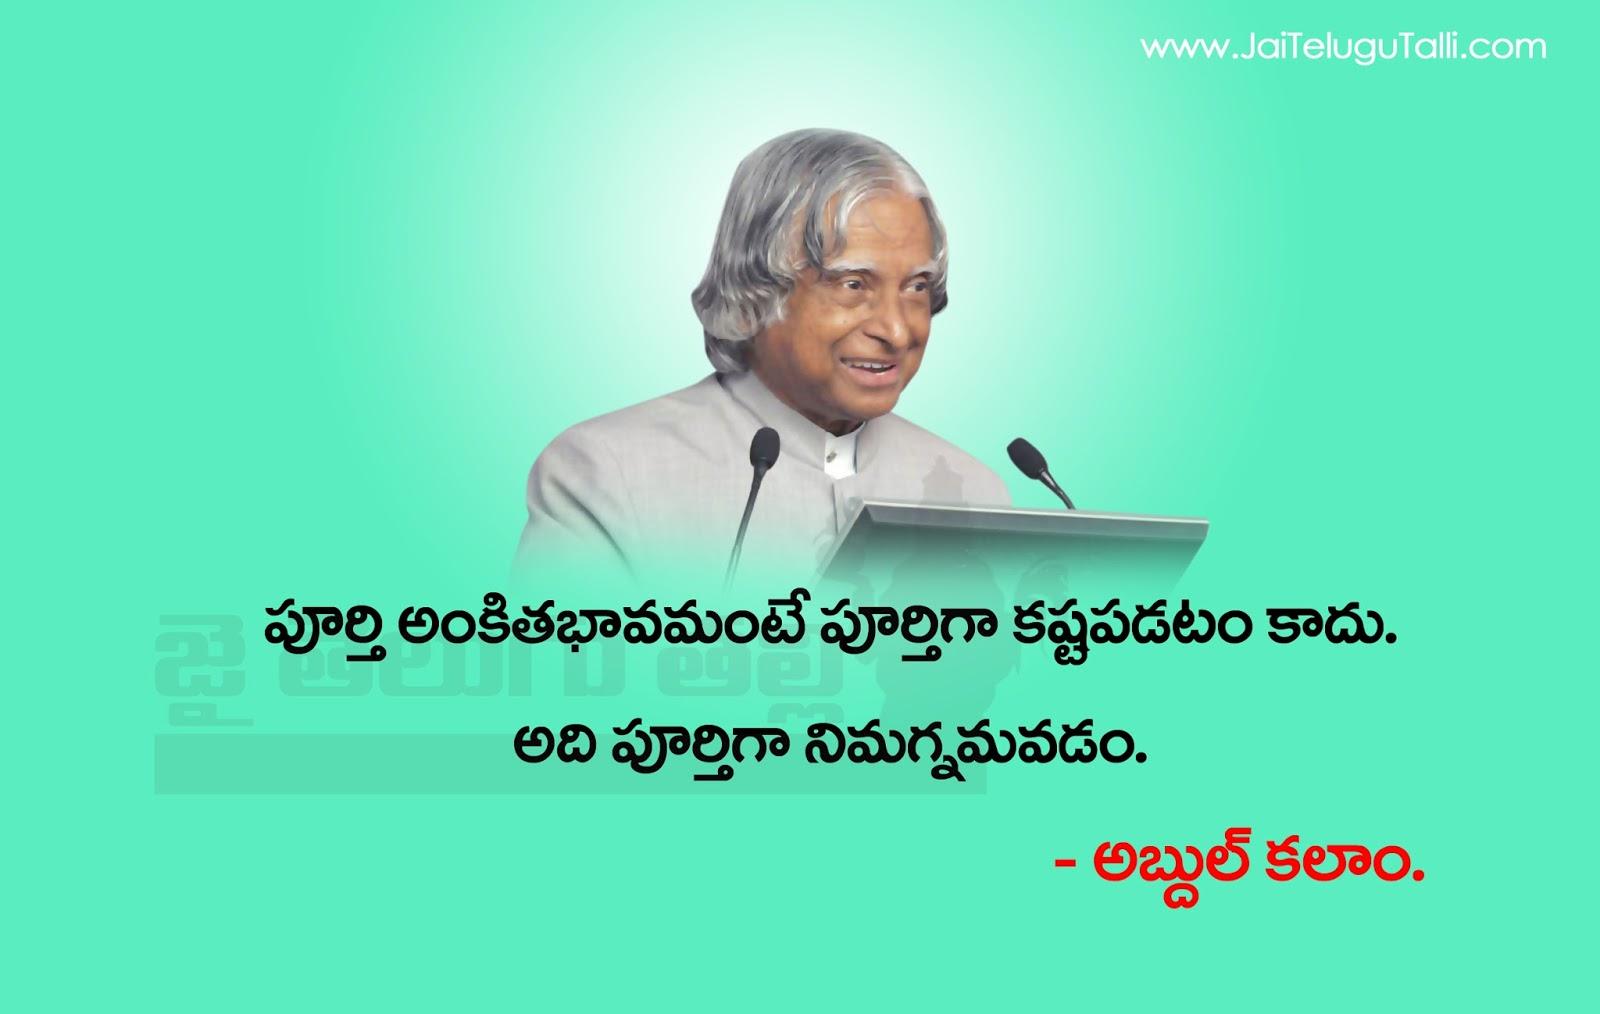 Powerful Telugu Quotes On Life In Telugu Language Spoken Life